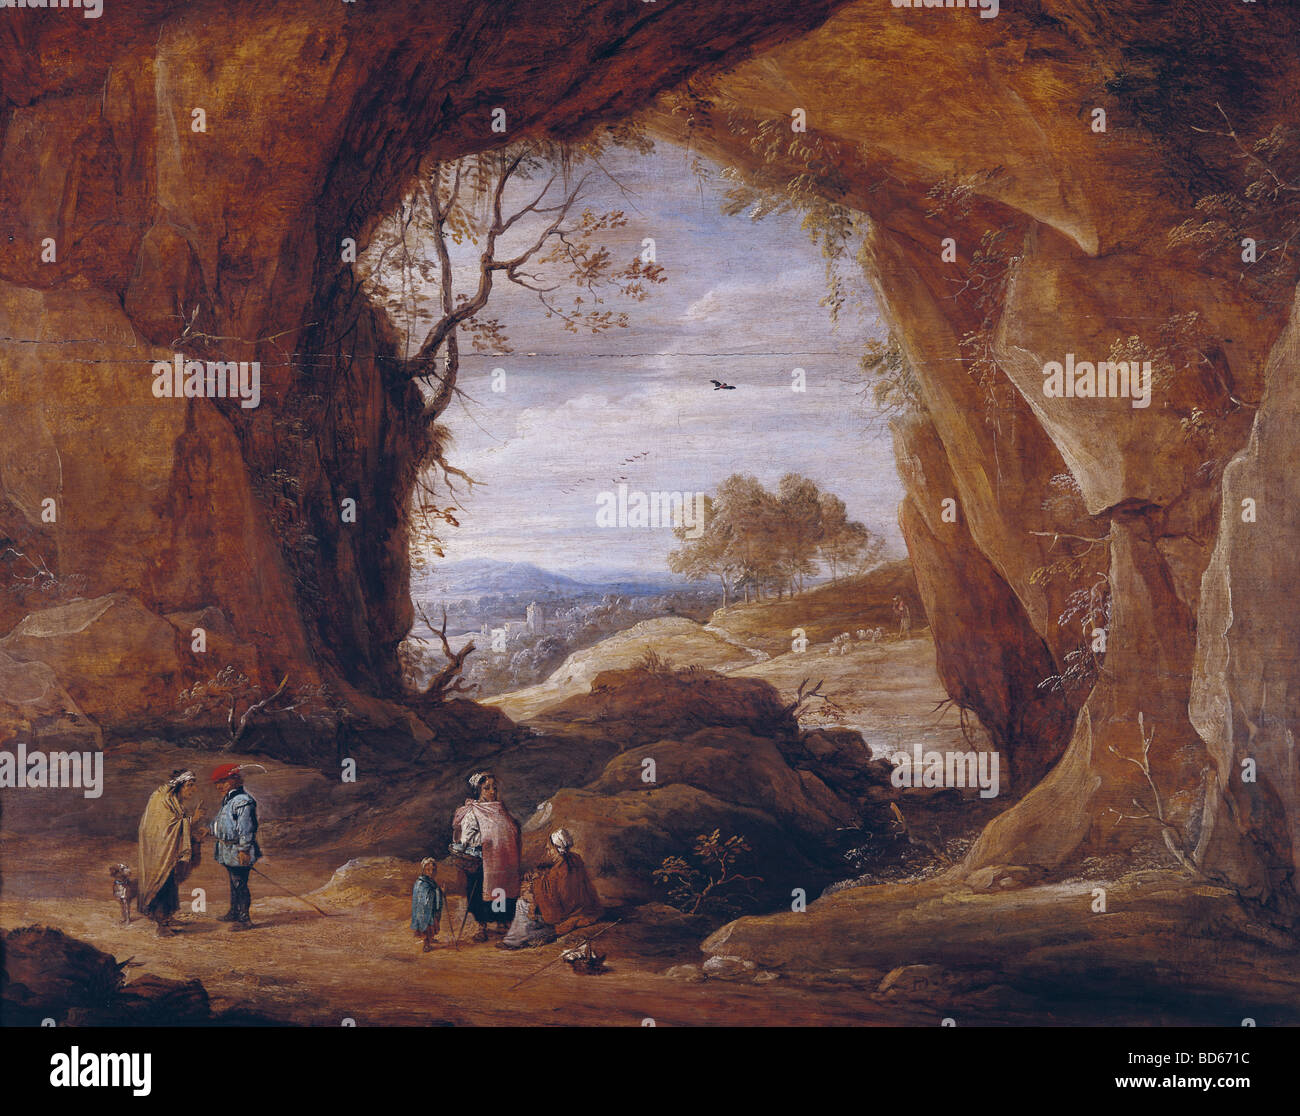 Teniers, David D.j. (1610-1690), Malerei, felsige Landschaft, Museum Lázaro Galdiano, Madrid, Niederländisch, Stockbild